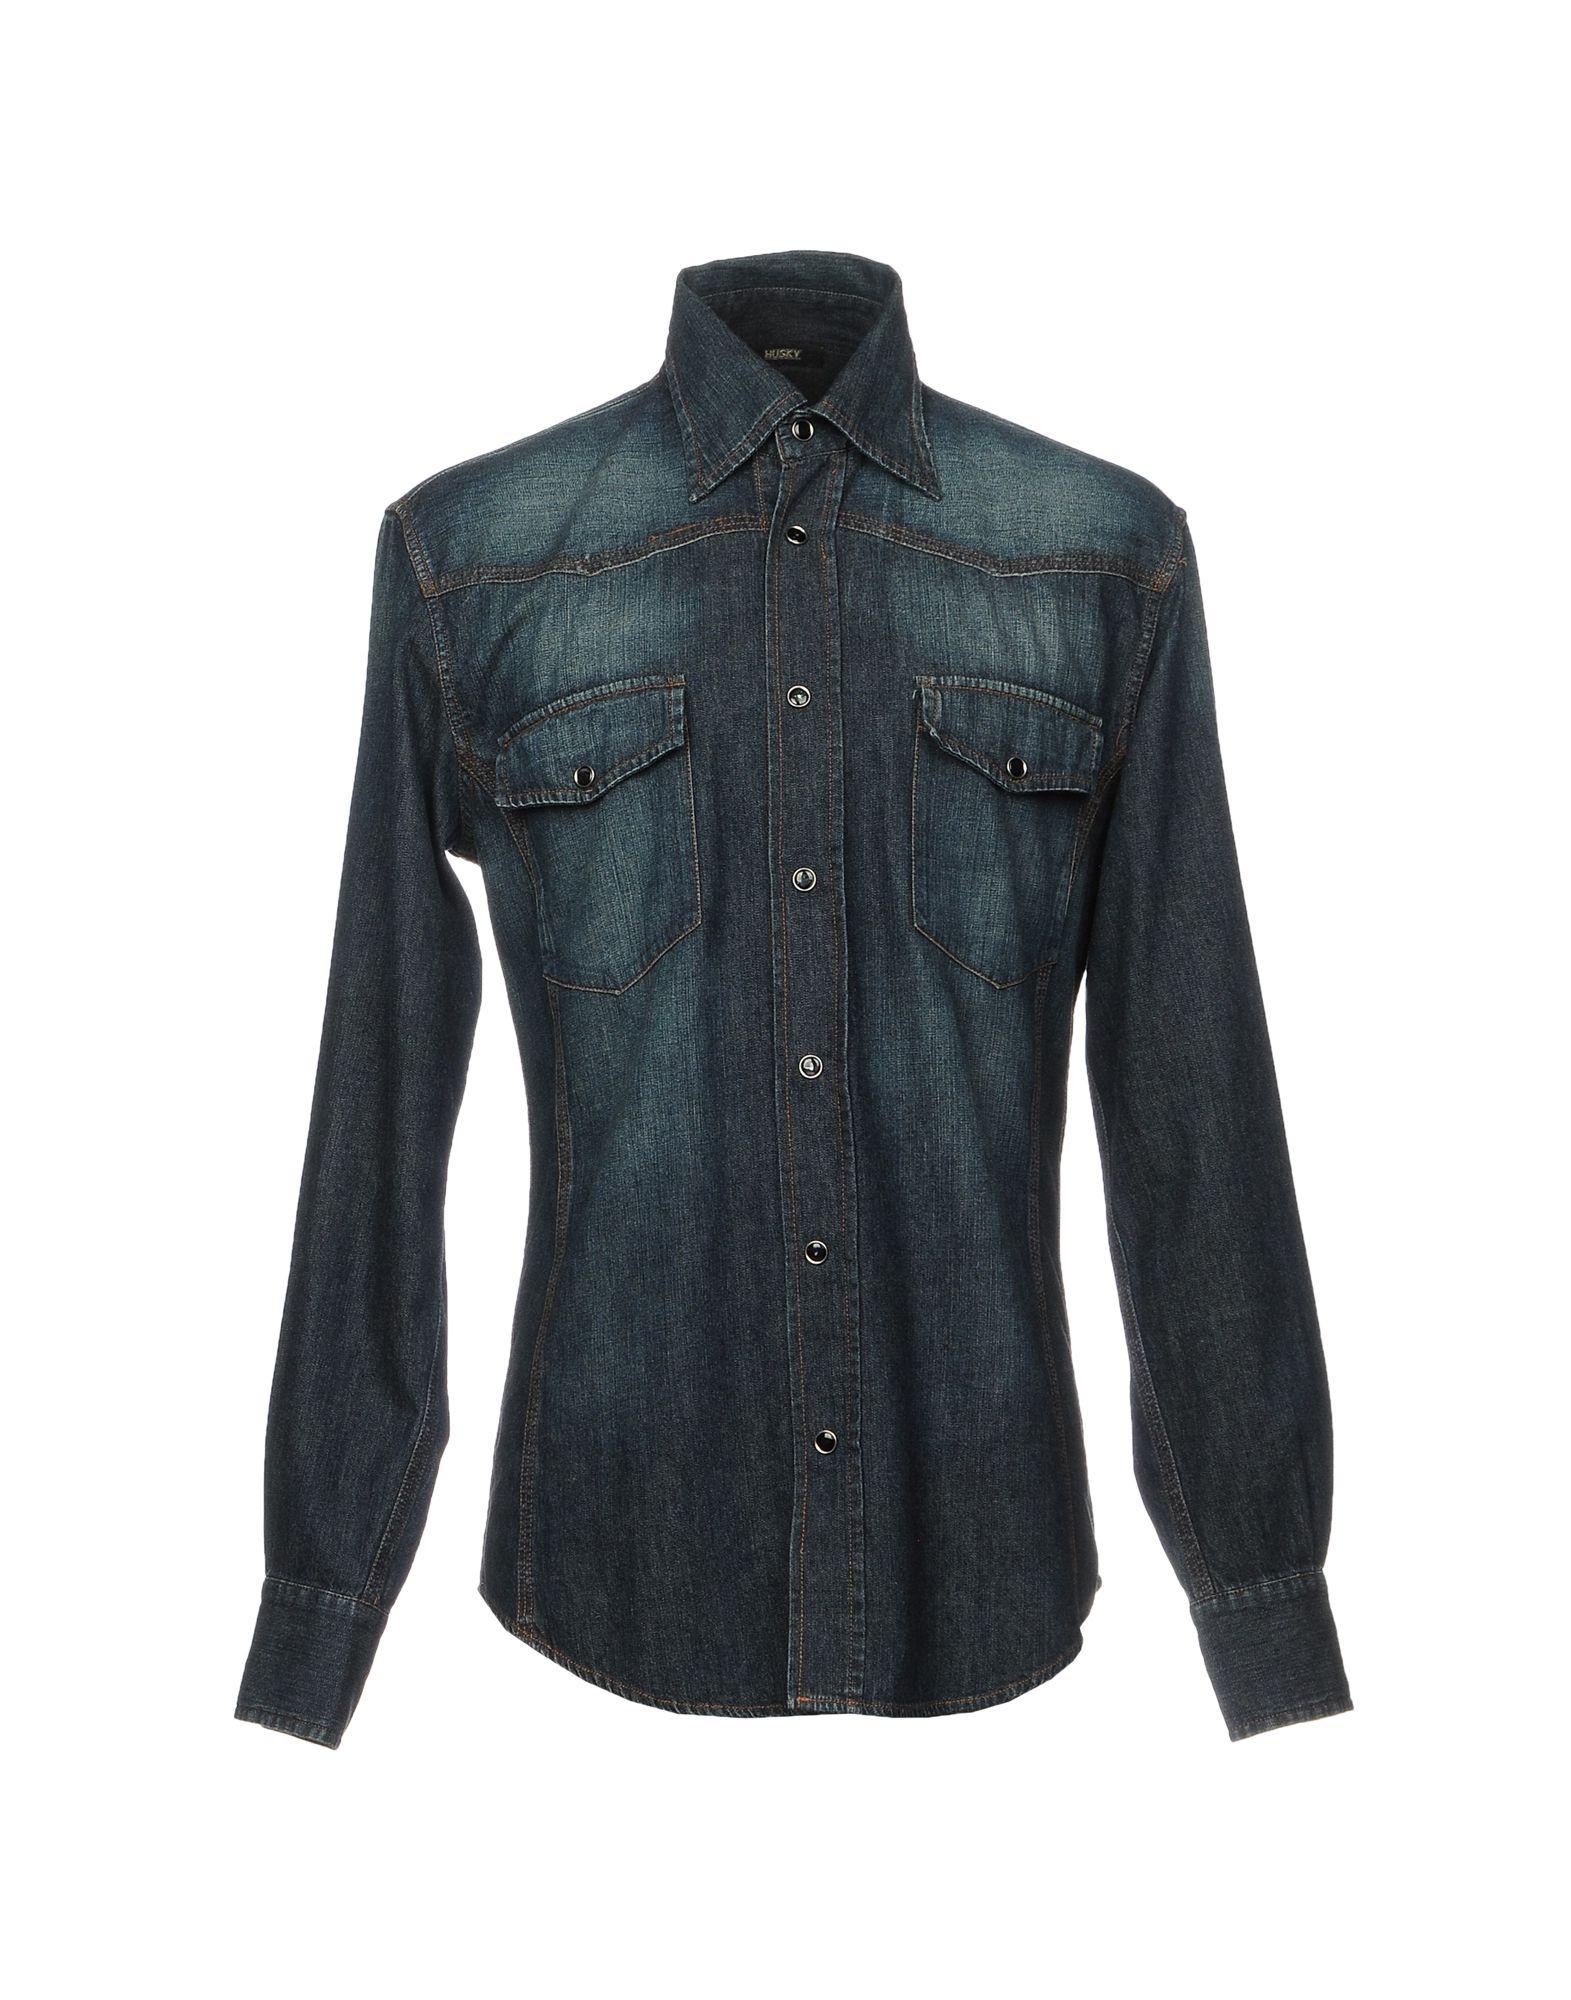 HUSKY Джинсовая рубашка рубашка animal husky shirt greeny